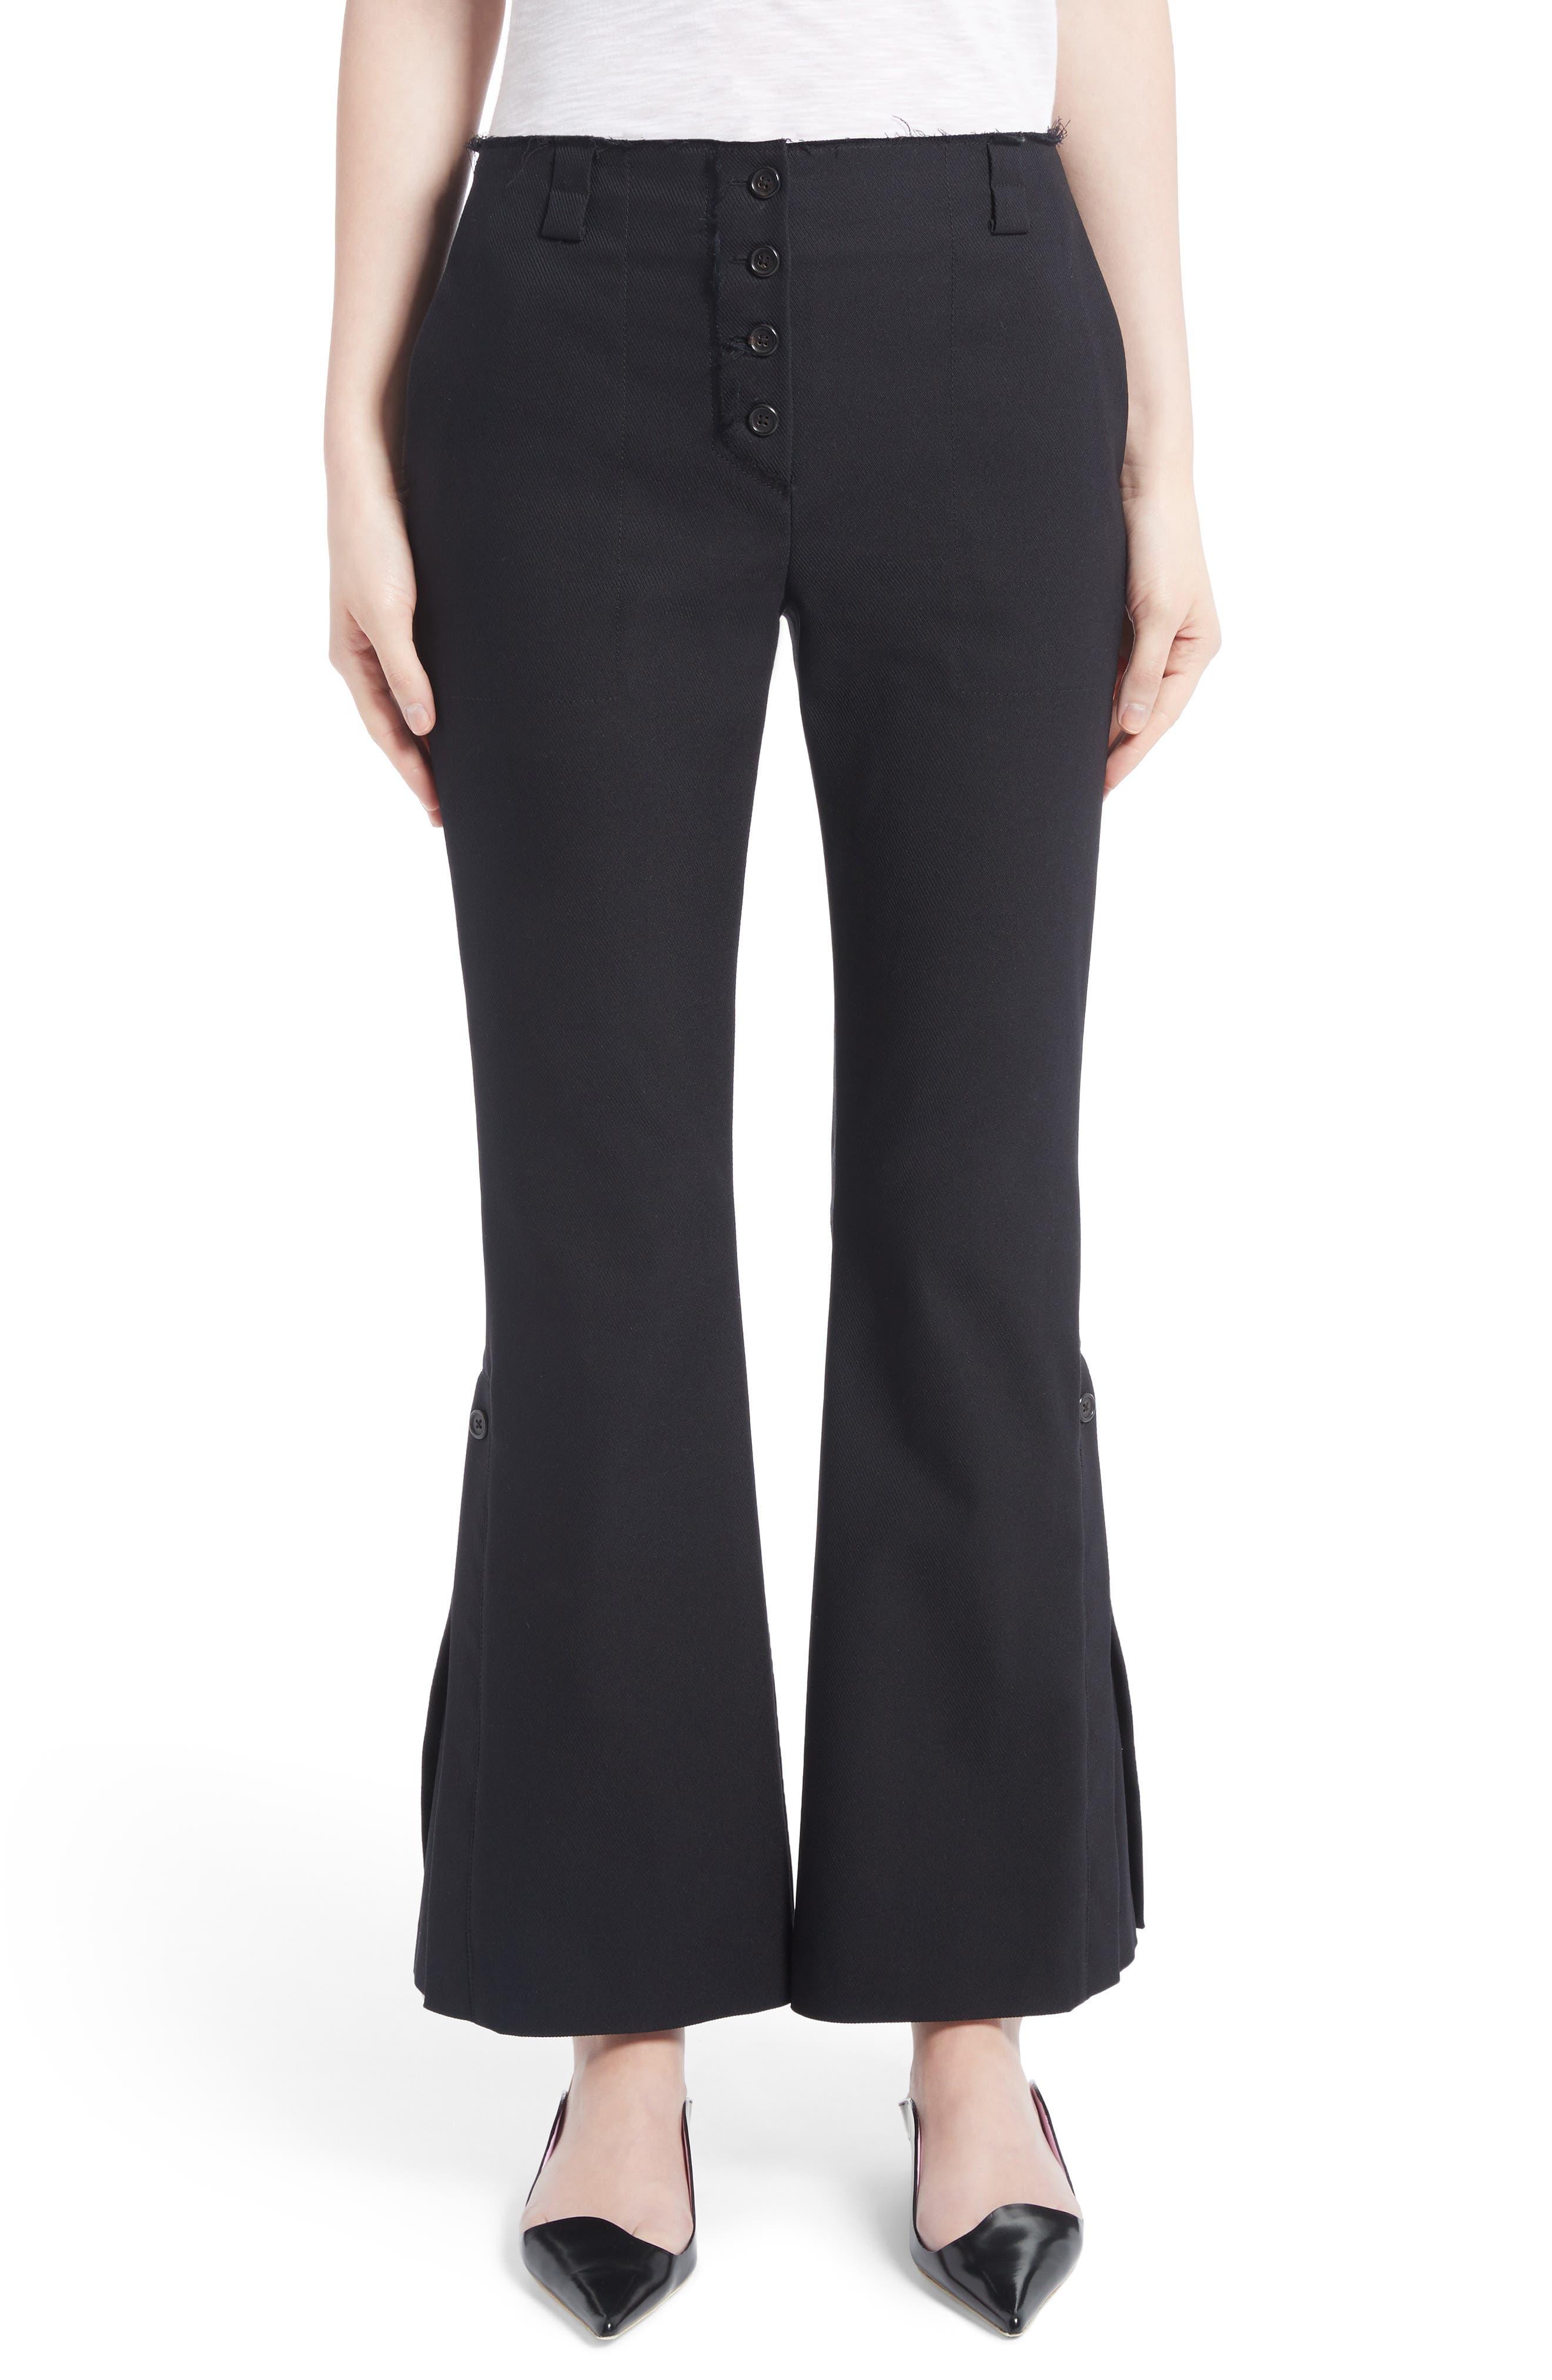 Main Image - Proenza Schouler Stretch Cotton Blend Flare Pants